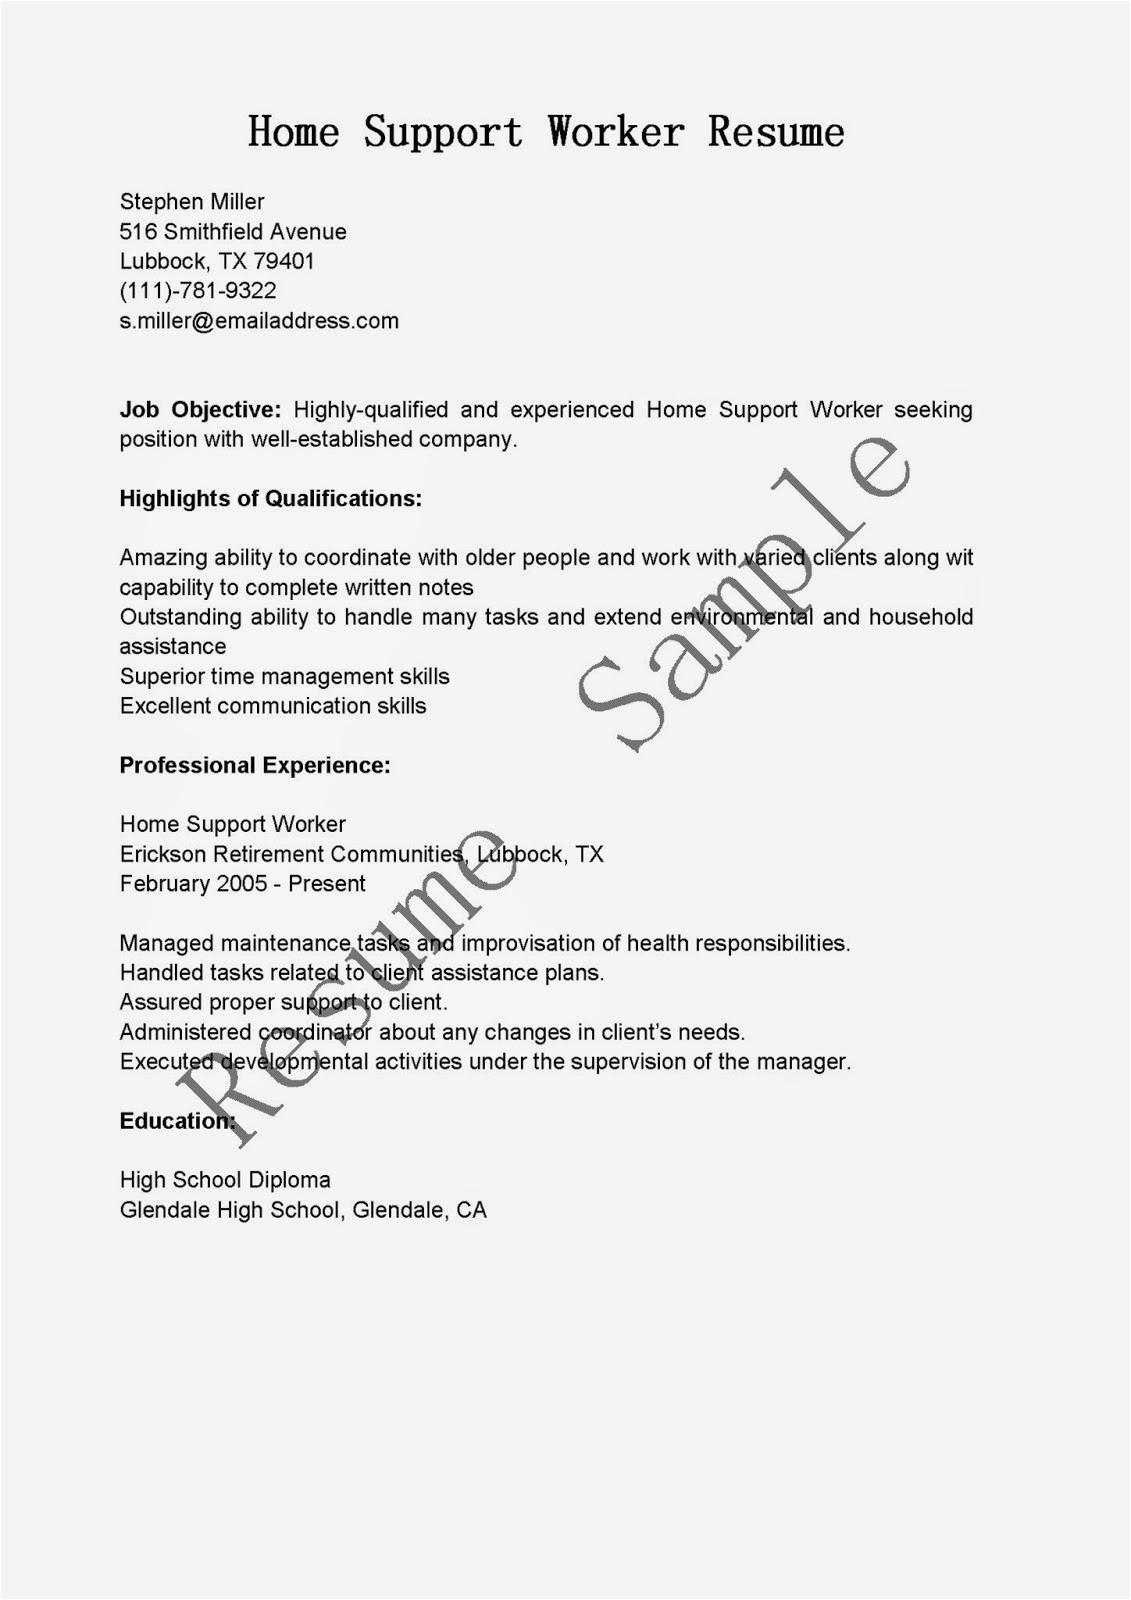 Sample Resume for Home Support Worker Resume Samples Home Support Worker Resume Sample